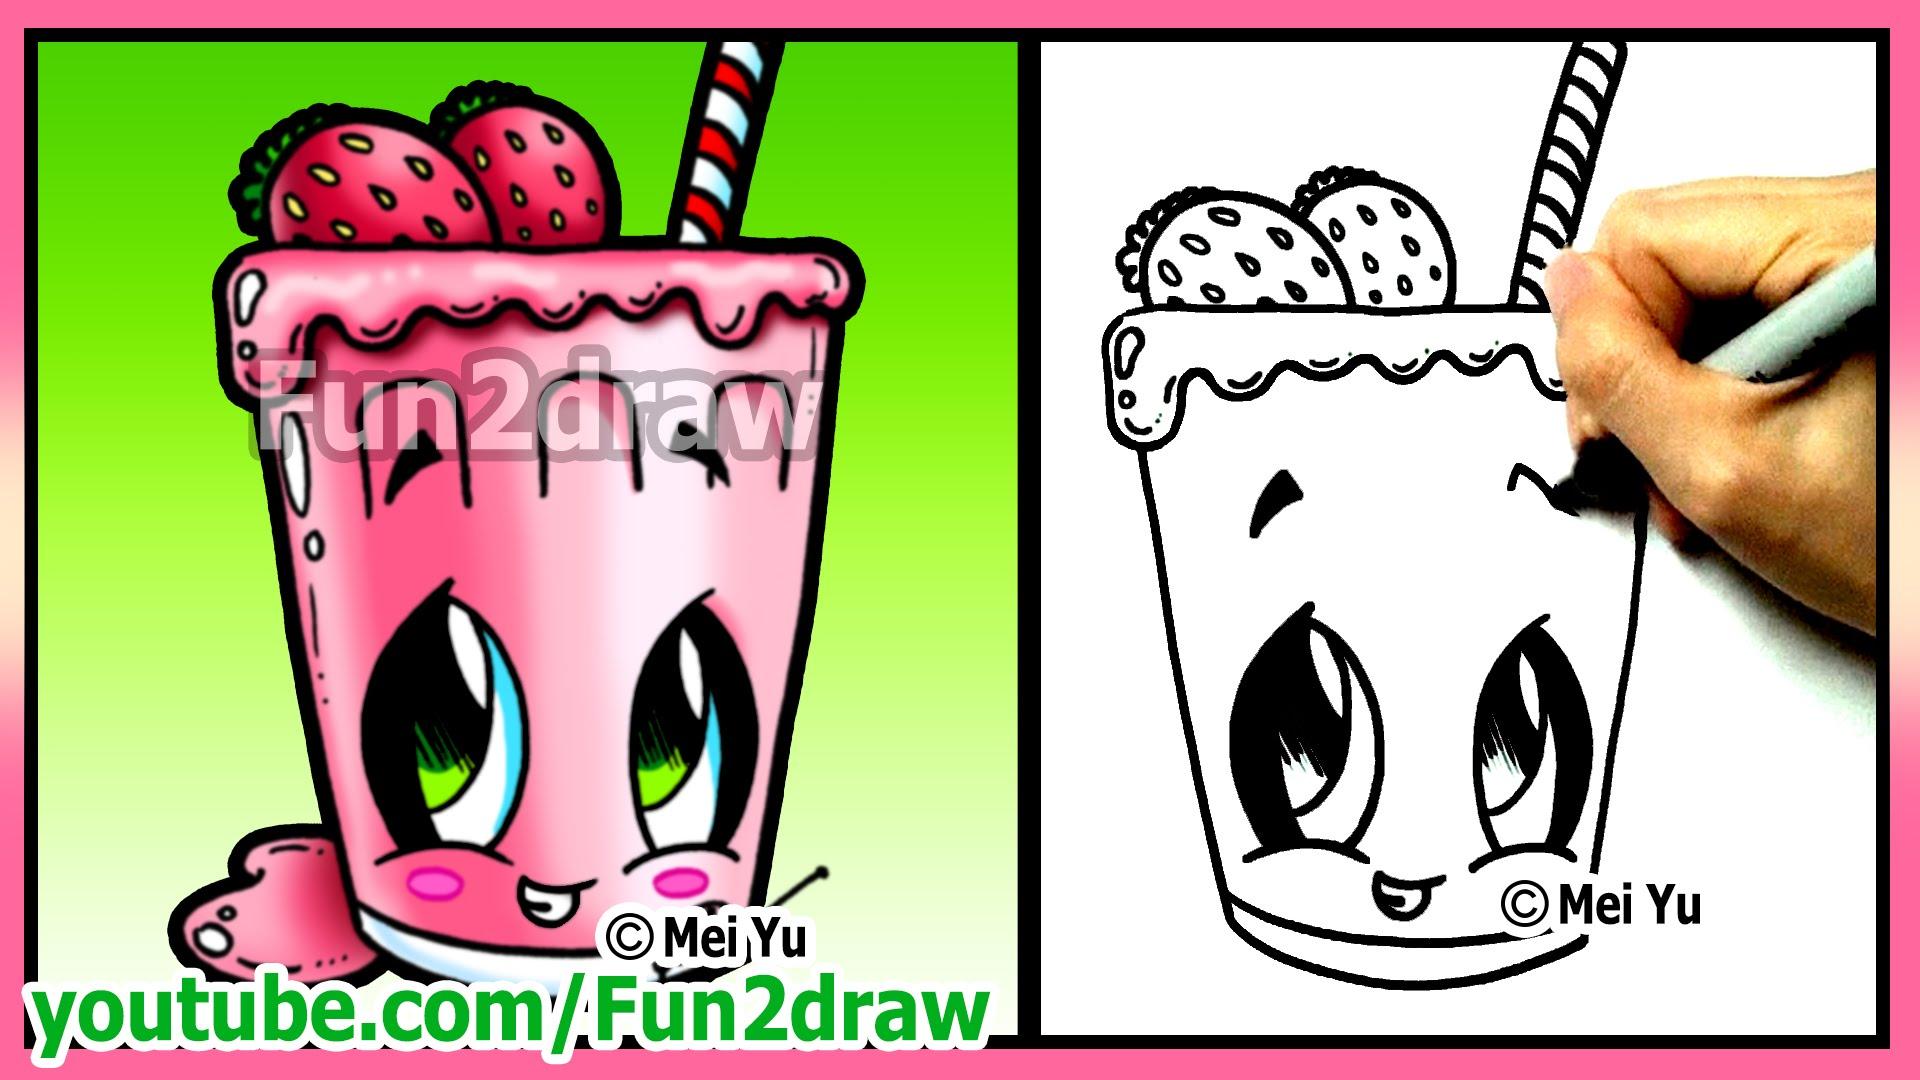 Drawn strawberry fun2draw Smoothie Fruit Funny Food Easy